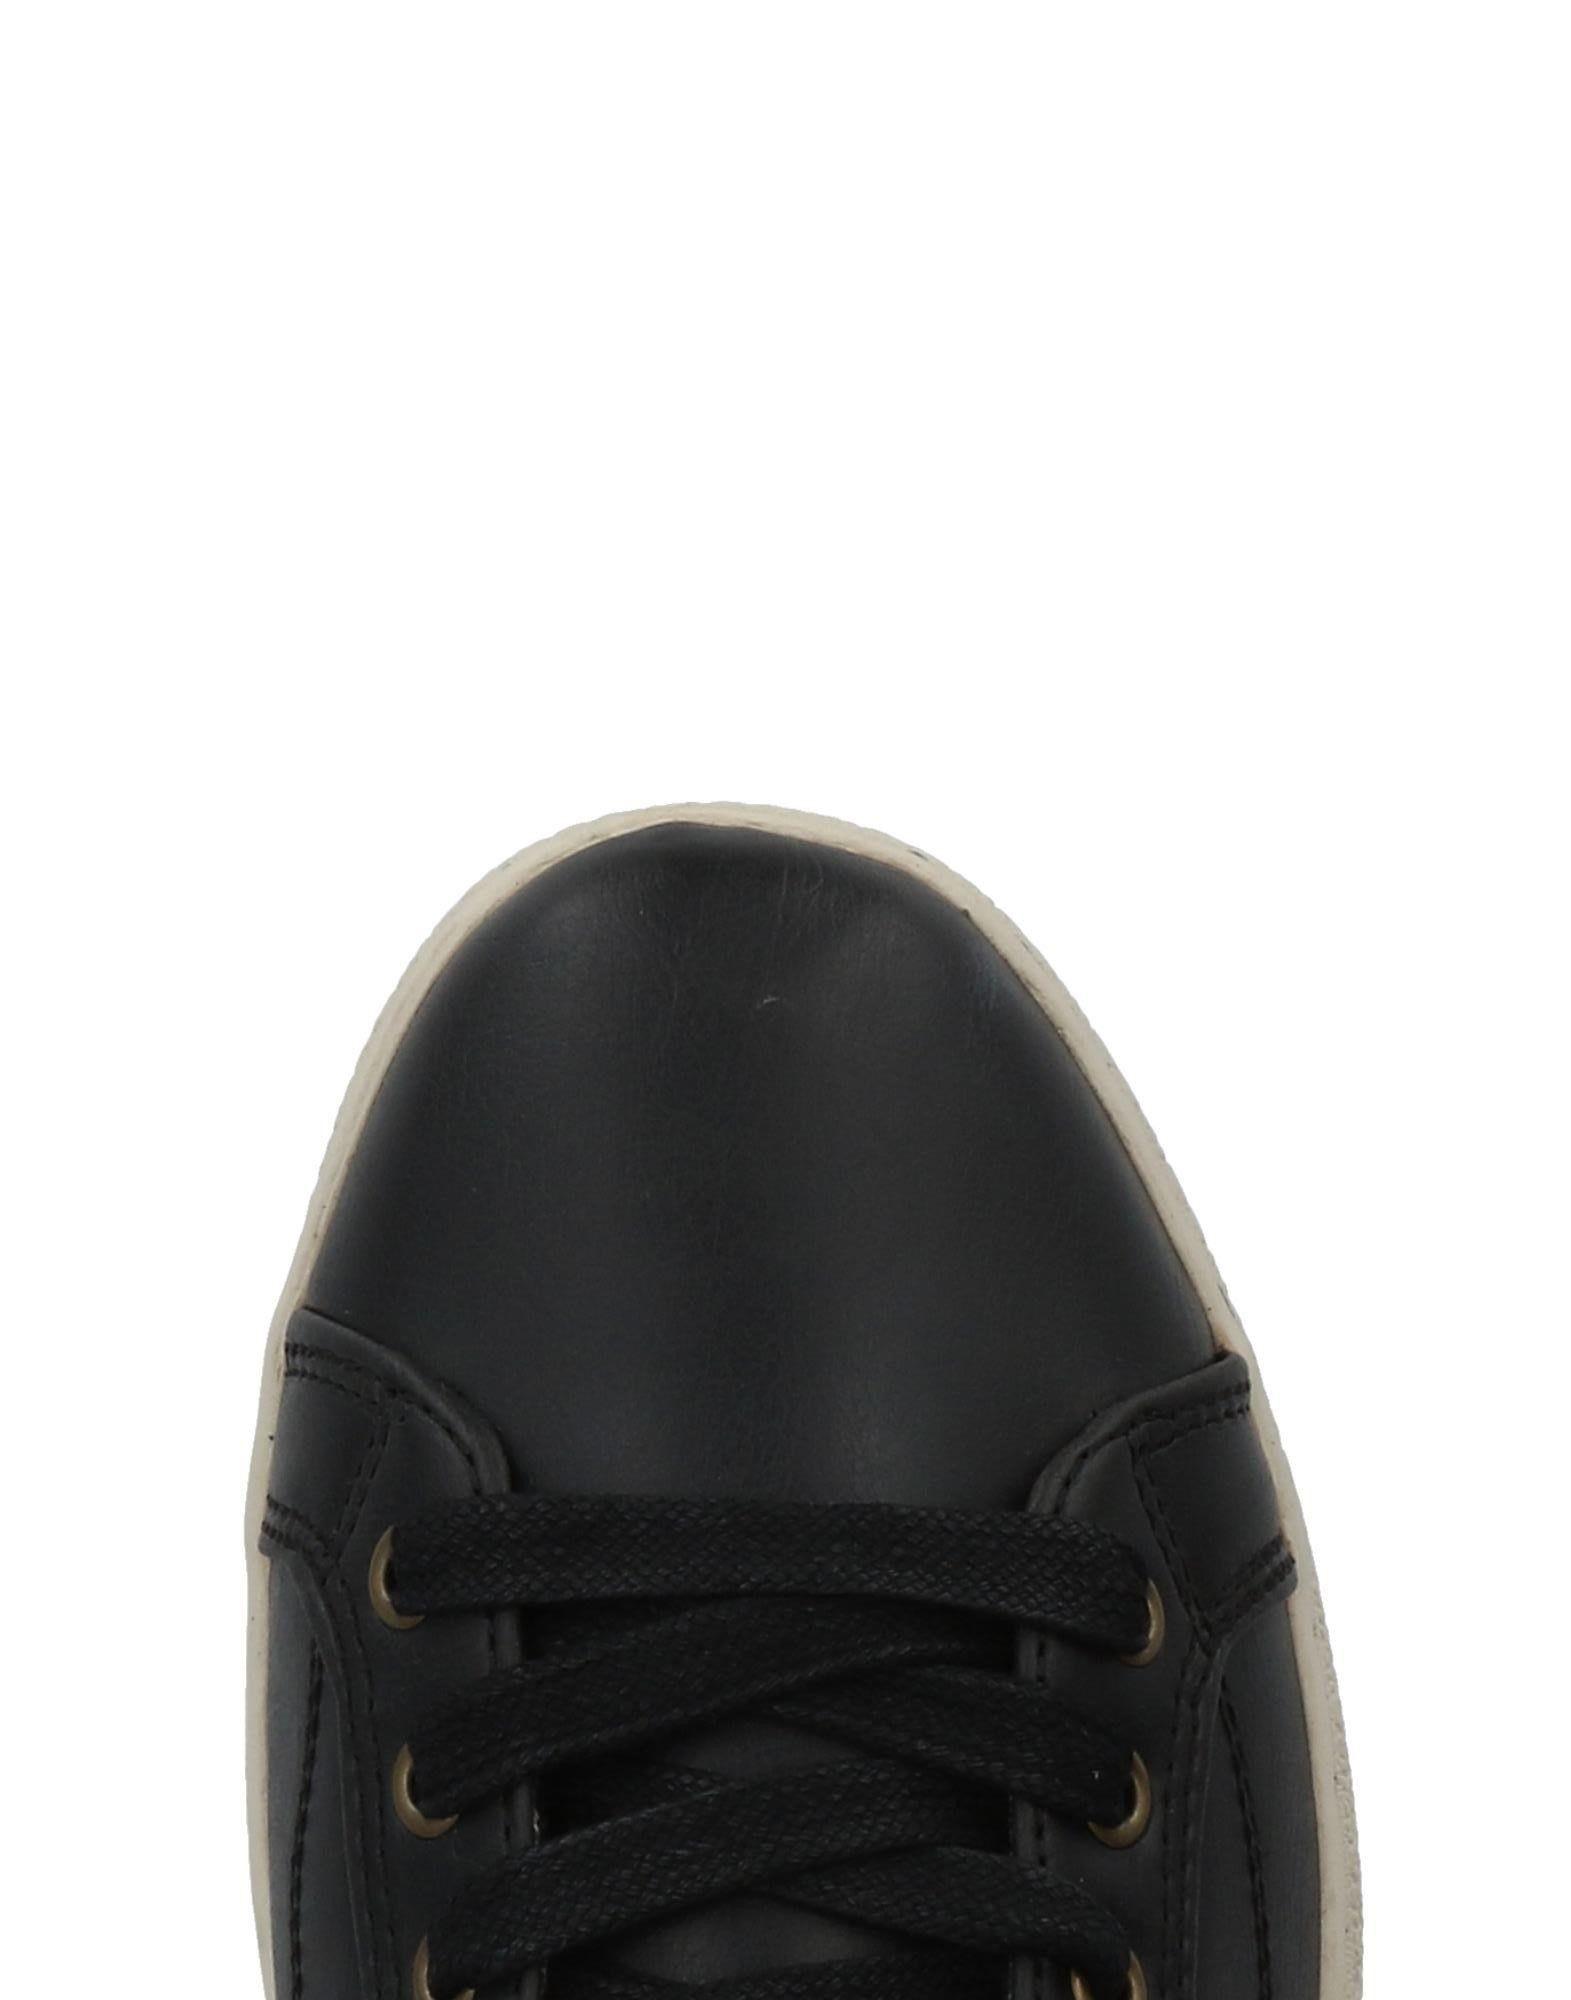 Rabatt echte Schuhe Herren Levi's ROT Tab Sneakers Herren Schuhe  11322871ED efc204